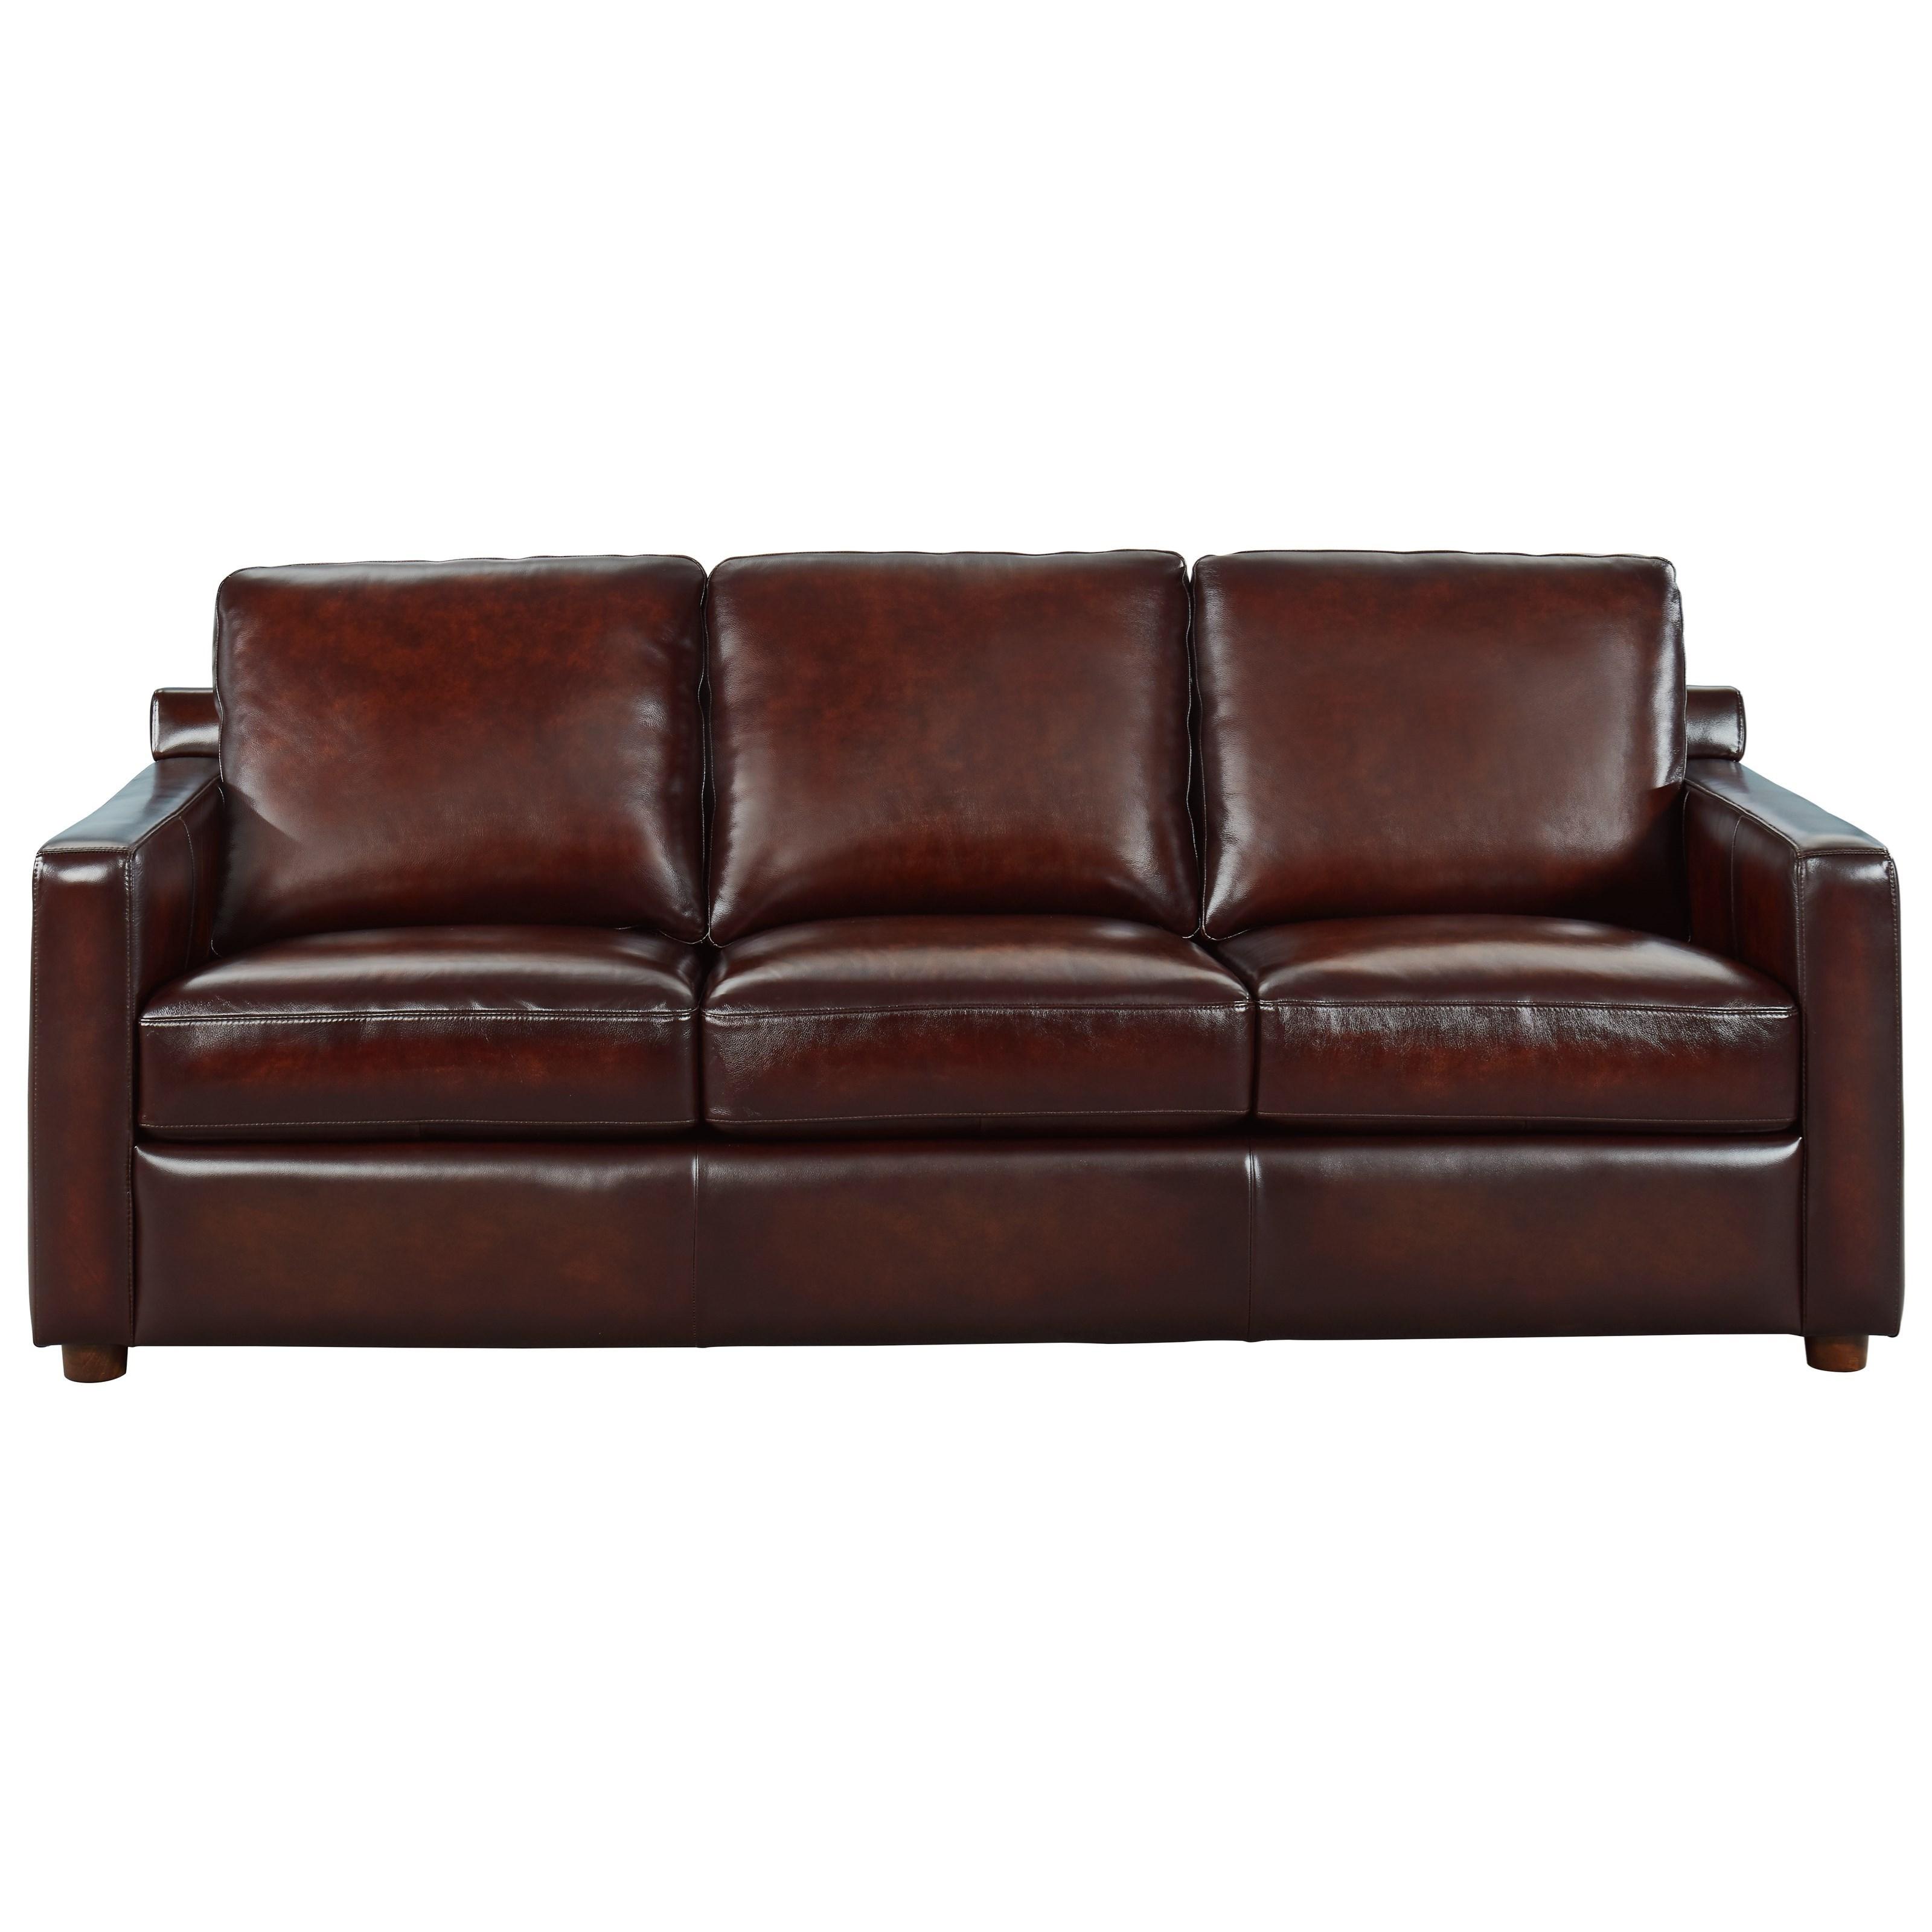 Stockton Sofa at Rotmans